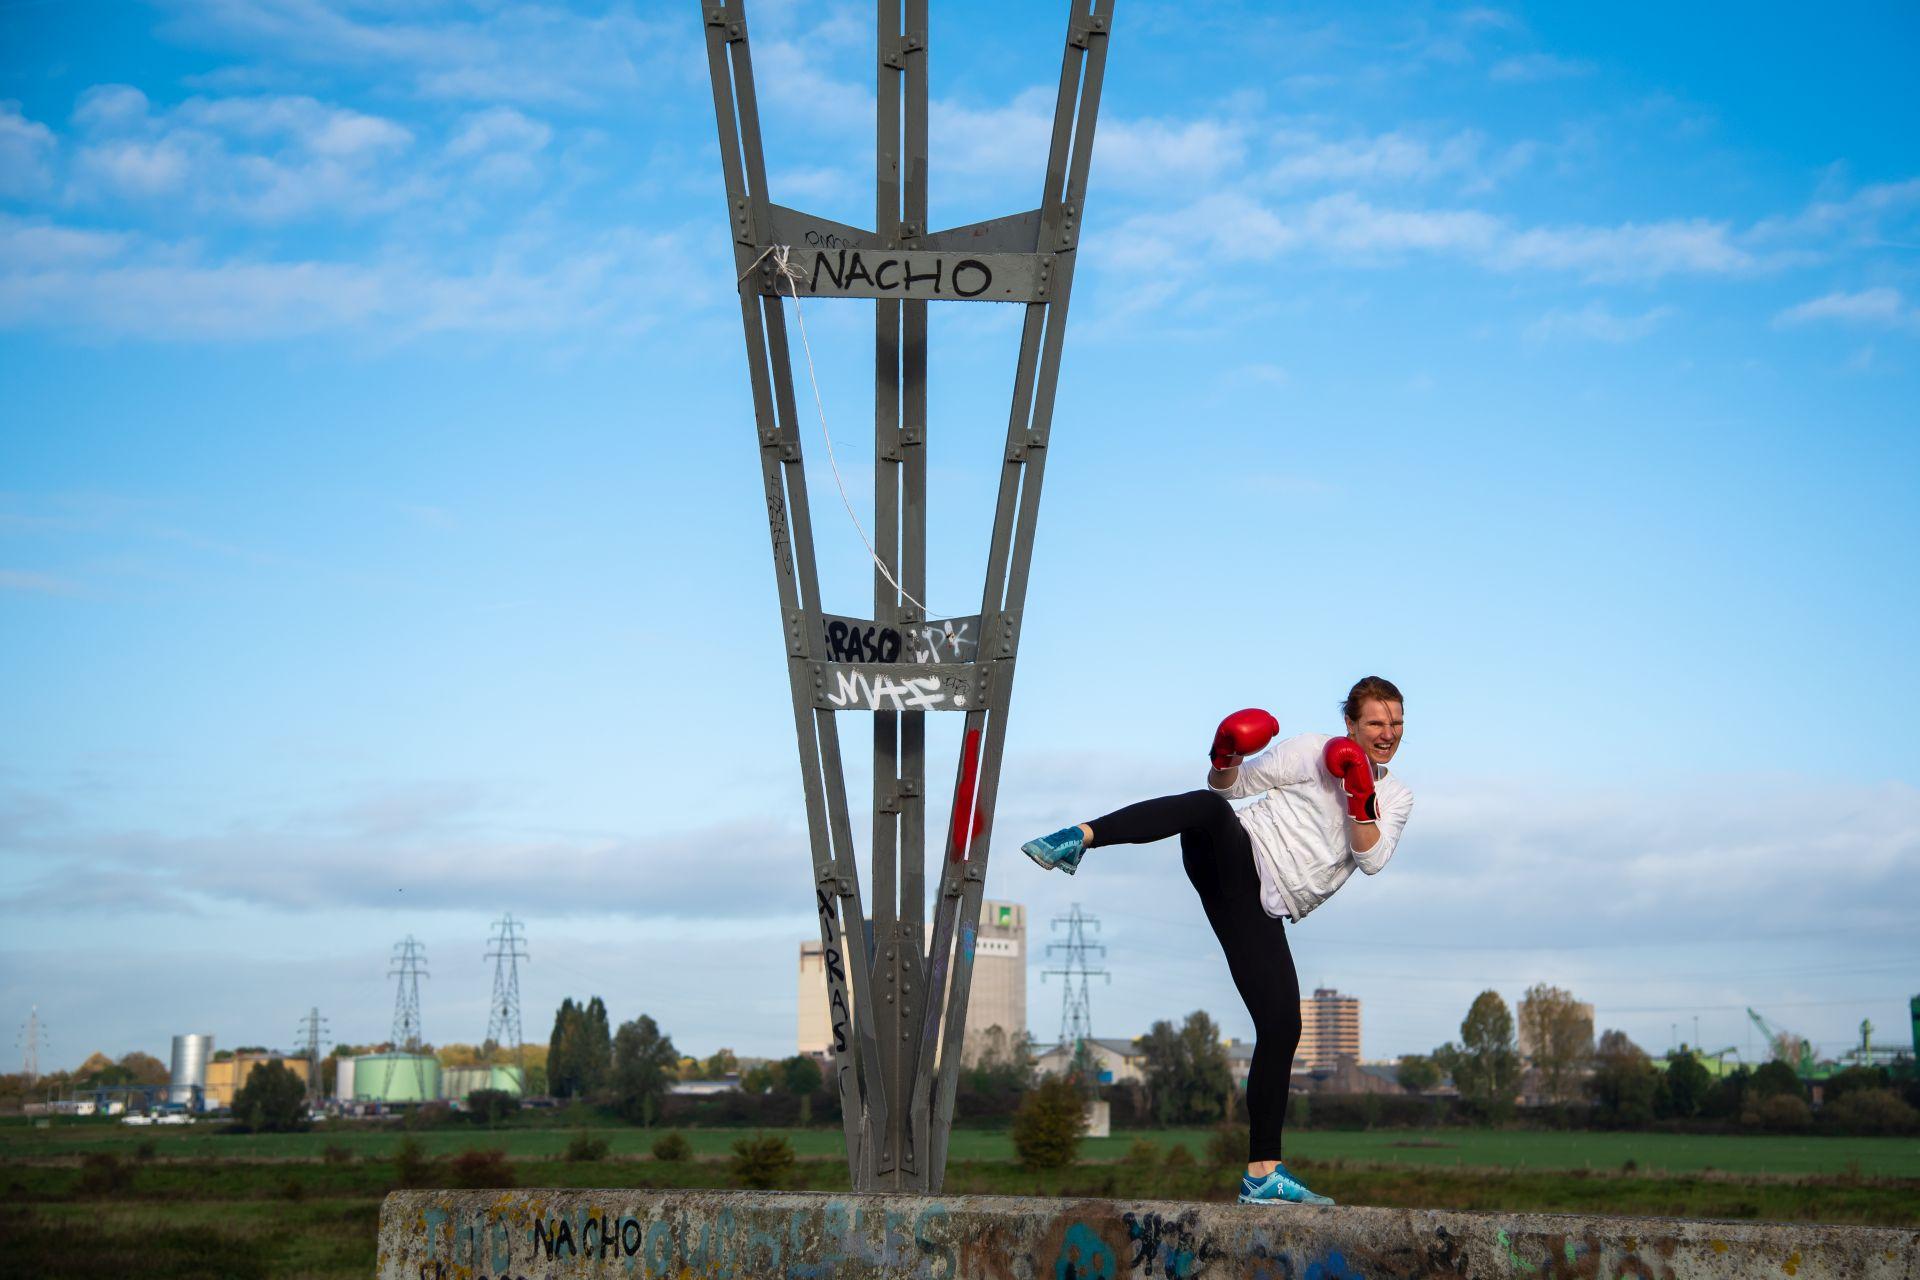 Yoga-en-boksen - Leefstijlcoach-Wageningen-Ede-Bennekom-yoga-coaching-personal-training_DSC_3636